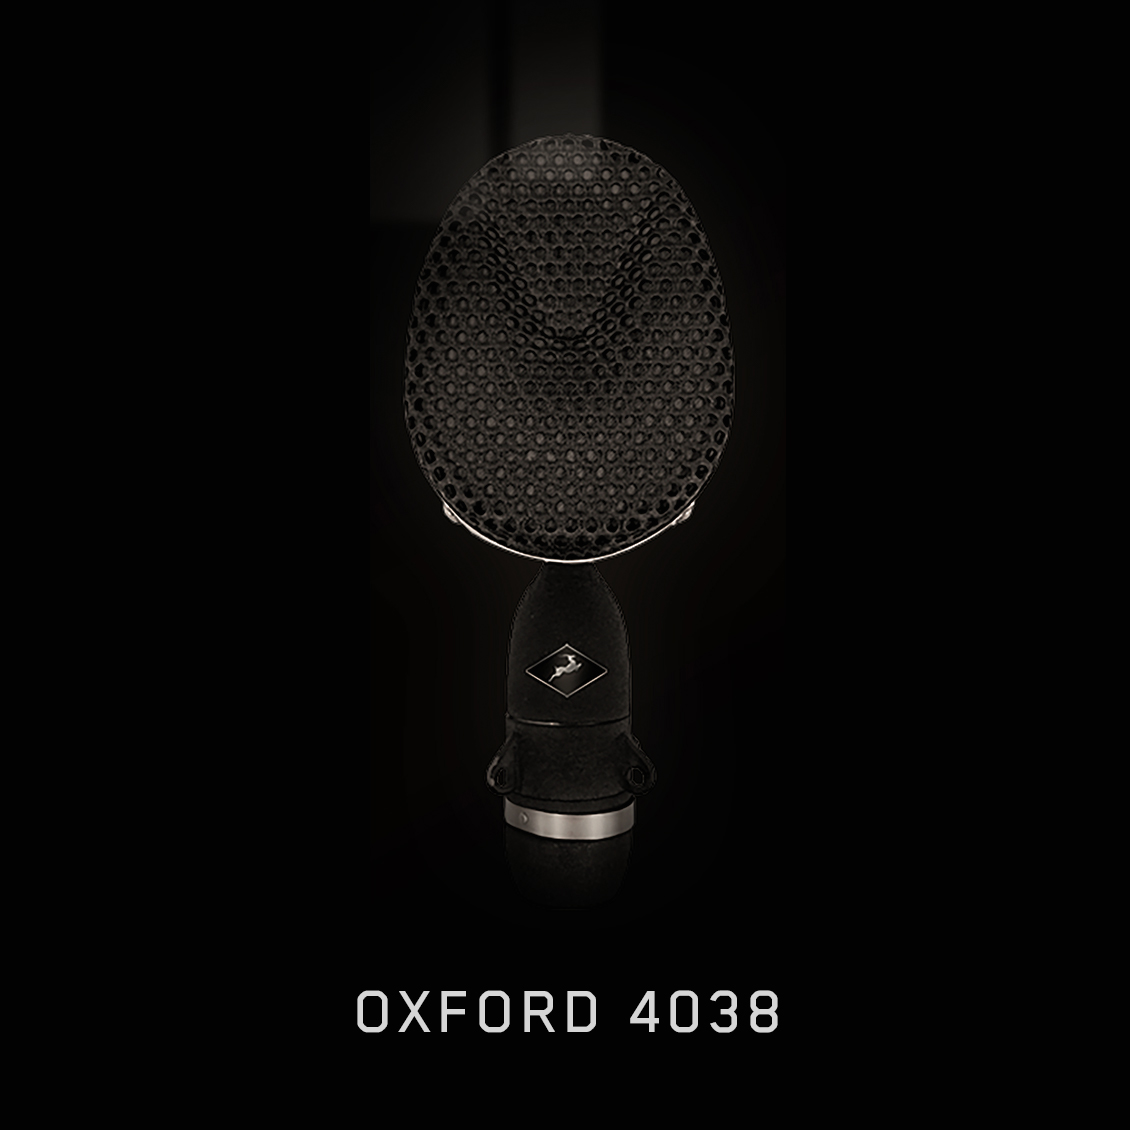 Oxford 4038